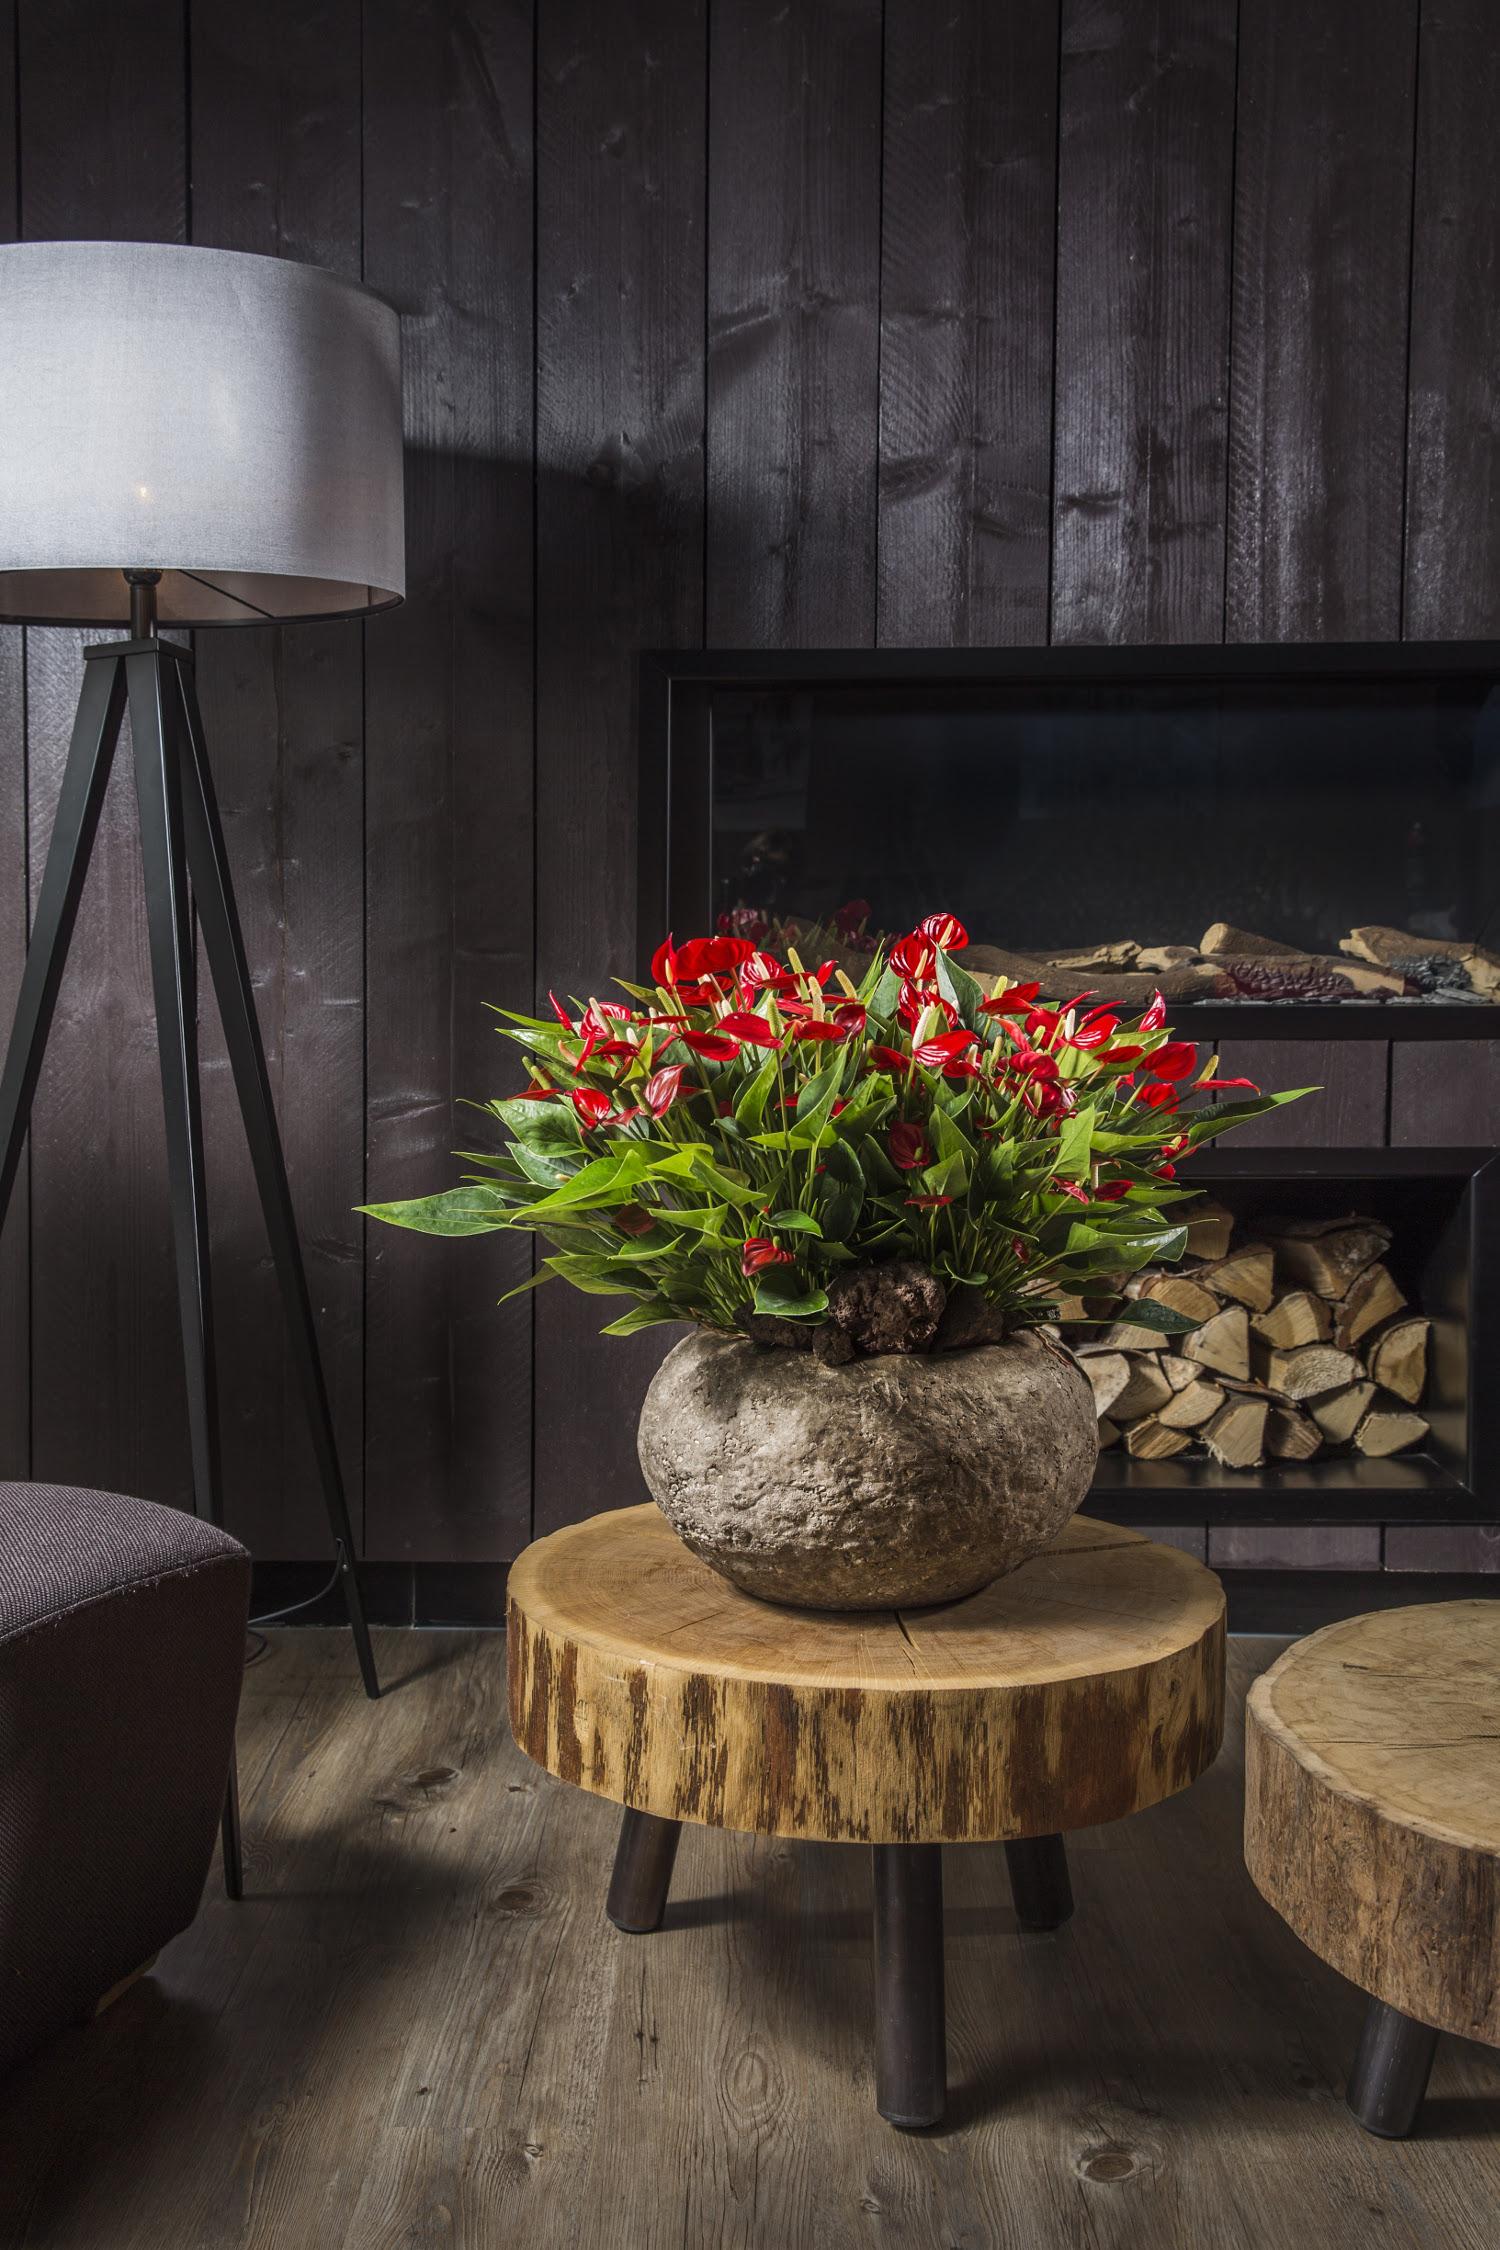 Make The Cut >> All about Anthurium pot plant and cut flower - Anthurium